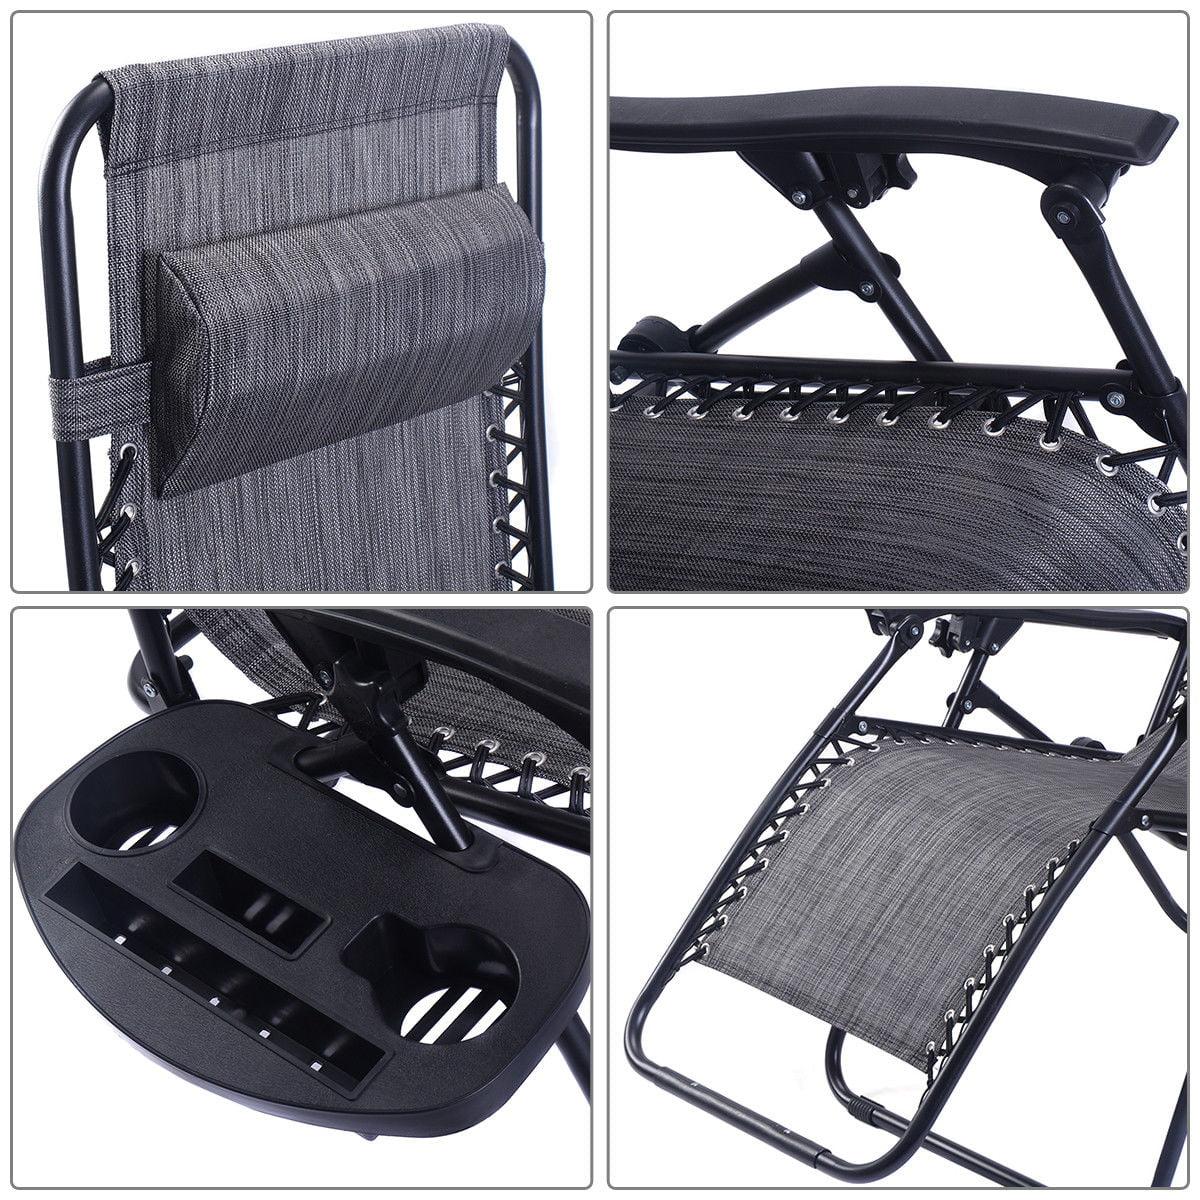 2PC Folding Zero Gravity Reclining Lounge Chairs Beach Patio W/ Utility Tray - image 5 of 8